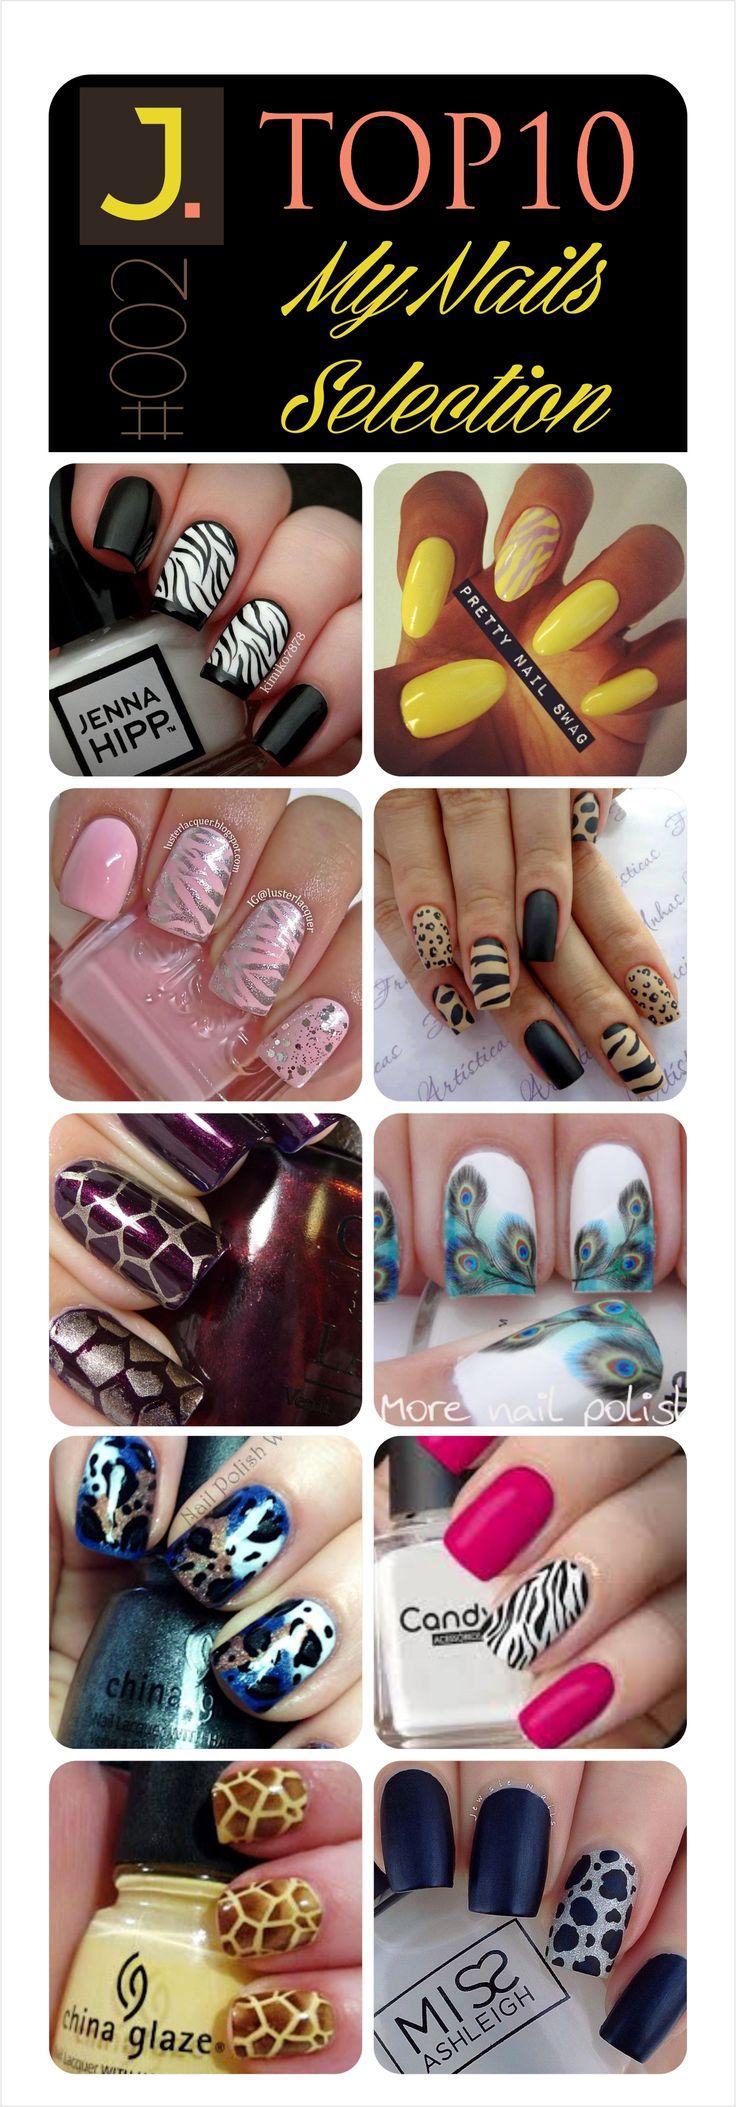 #002 - TOP10 - My Nails Selection @janefranciscomk #thanksforfollowme #followme #animalprint #leopard #nails #nailsart